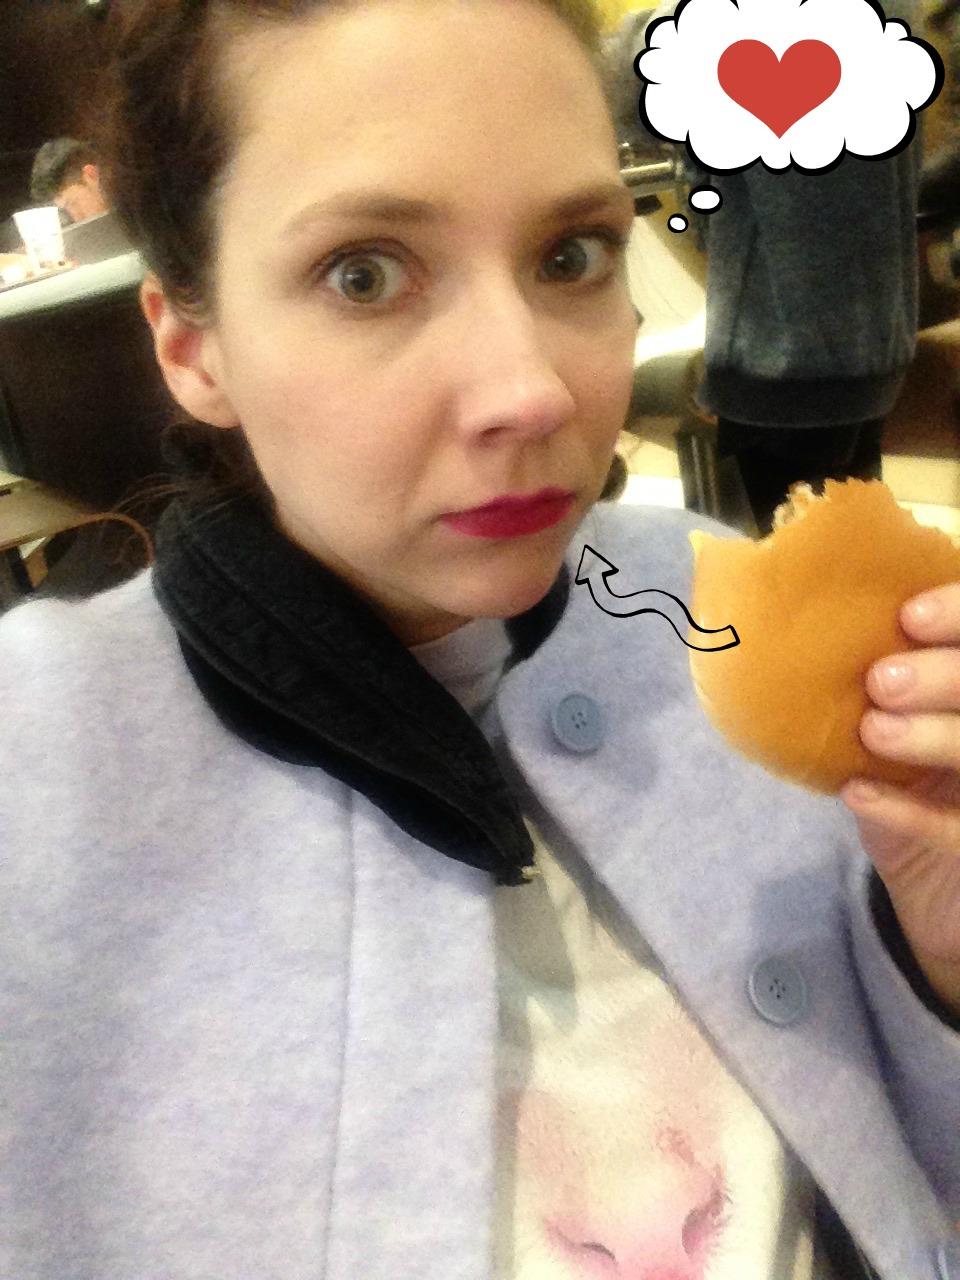 burger burger mjam mjam mjam